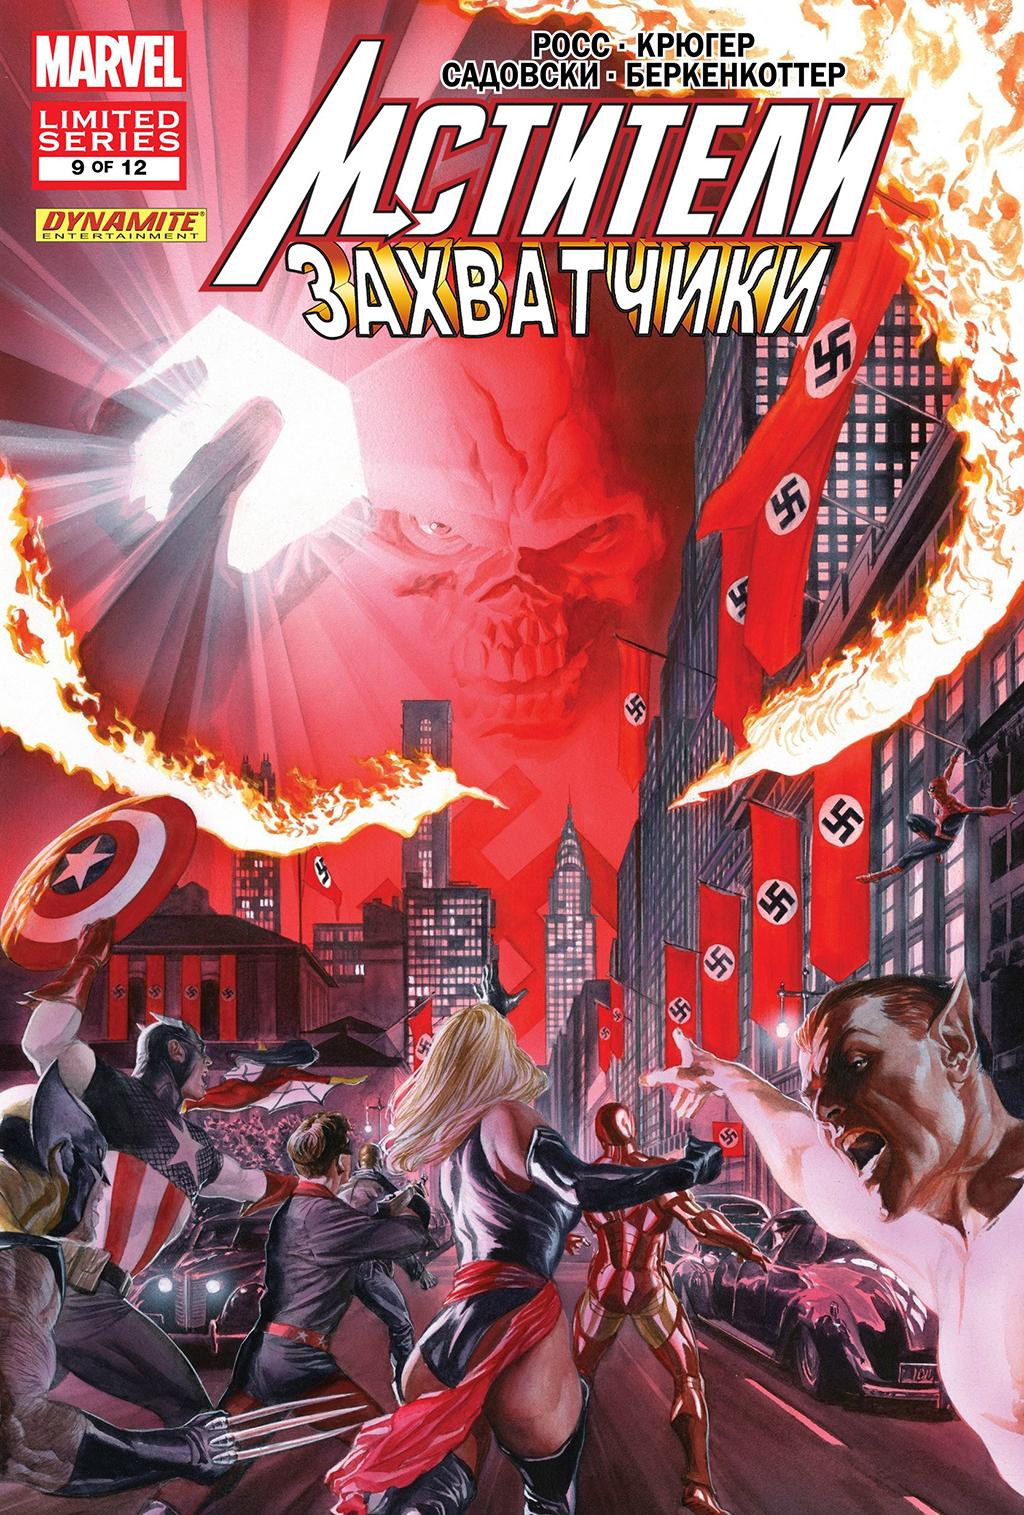 Комикс Мстители и Захватчики